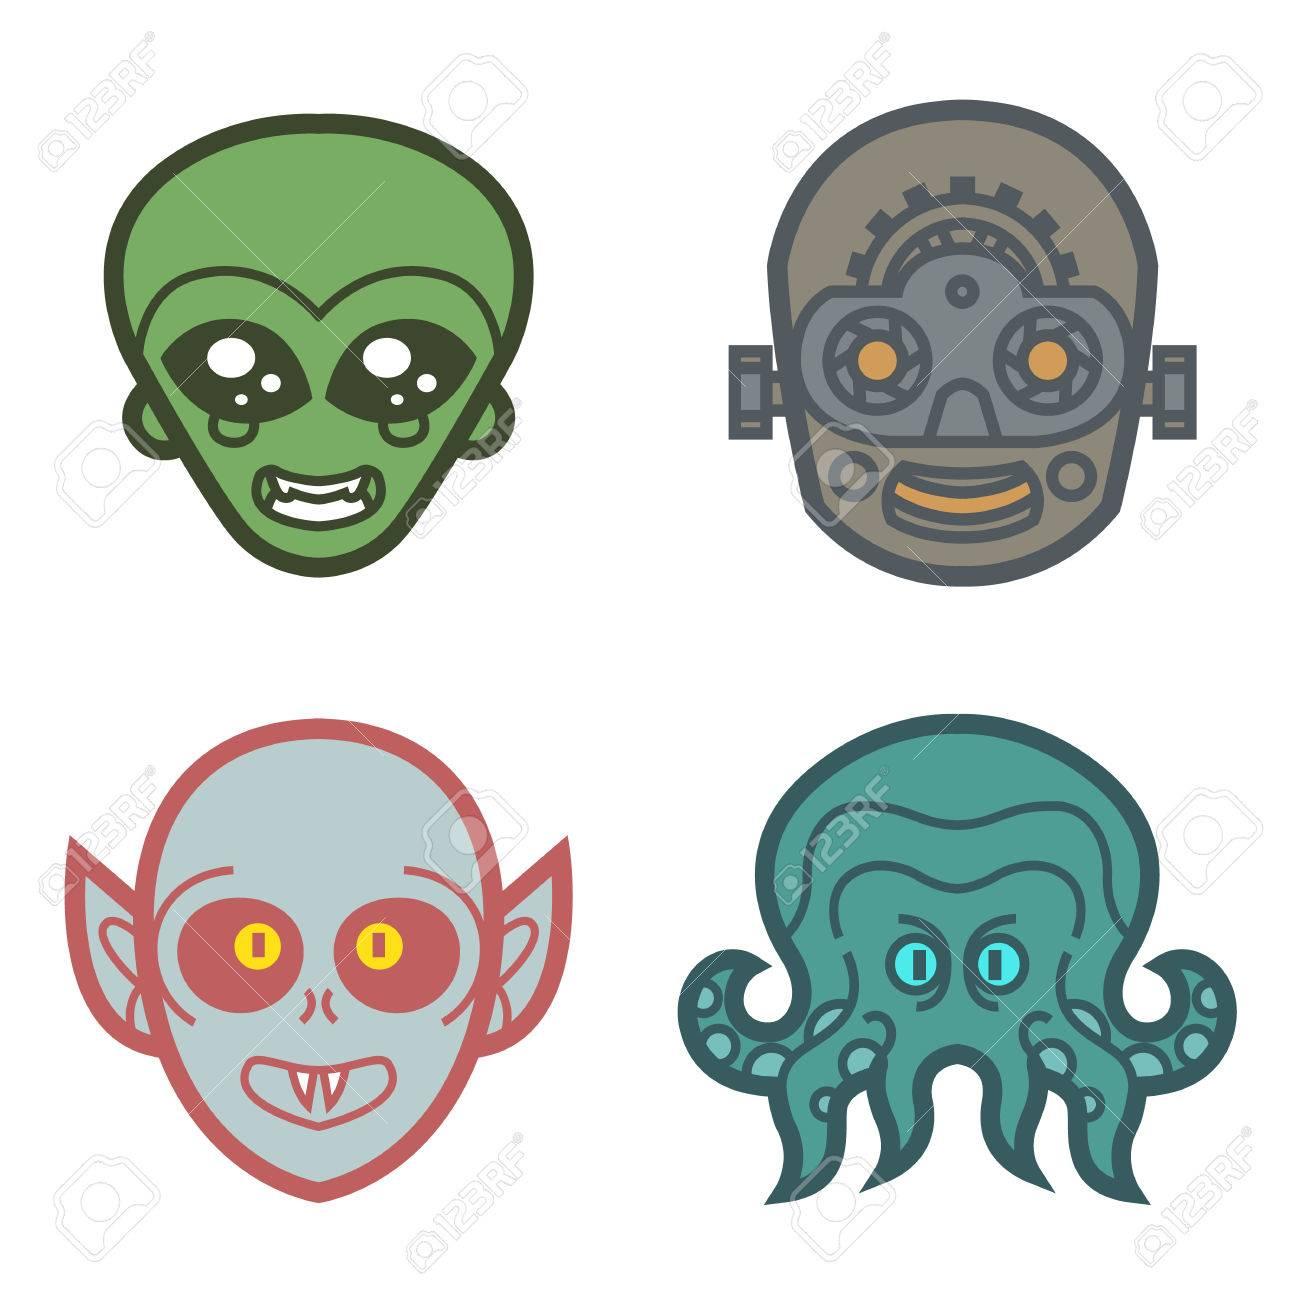 Vampire Ghoul Alien Extraterrestrial Robot Cyborg Monsters Cute ...